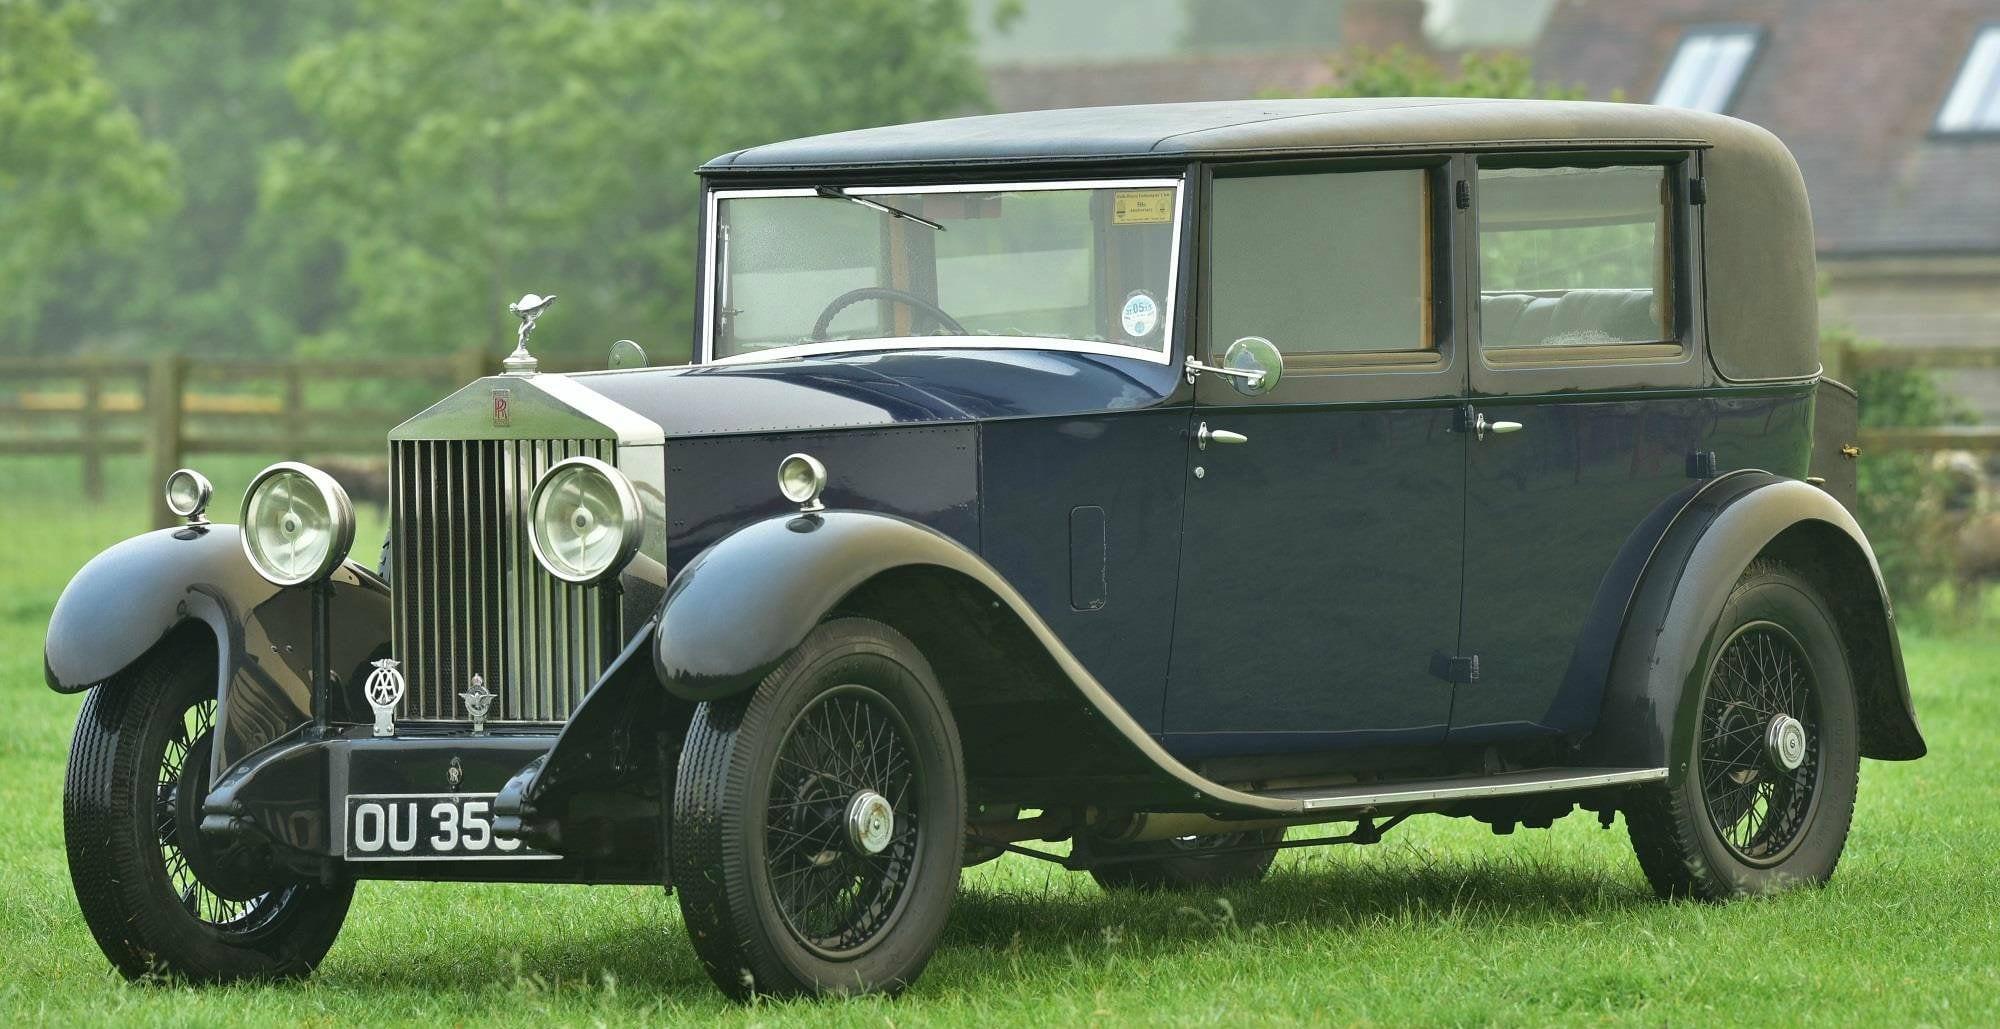 Modelo 20/25 de 1931